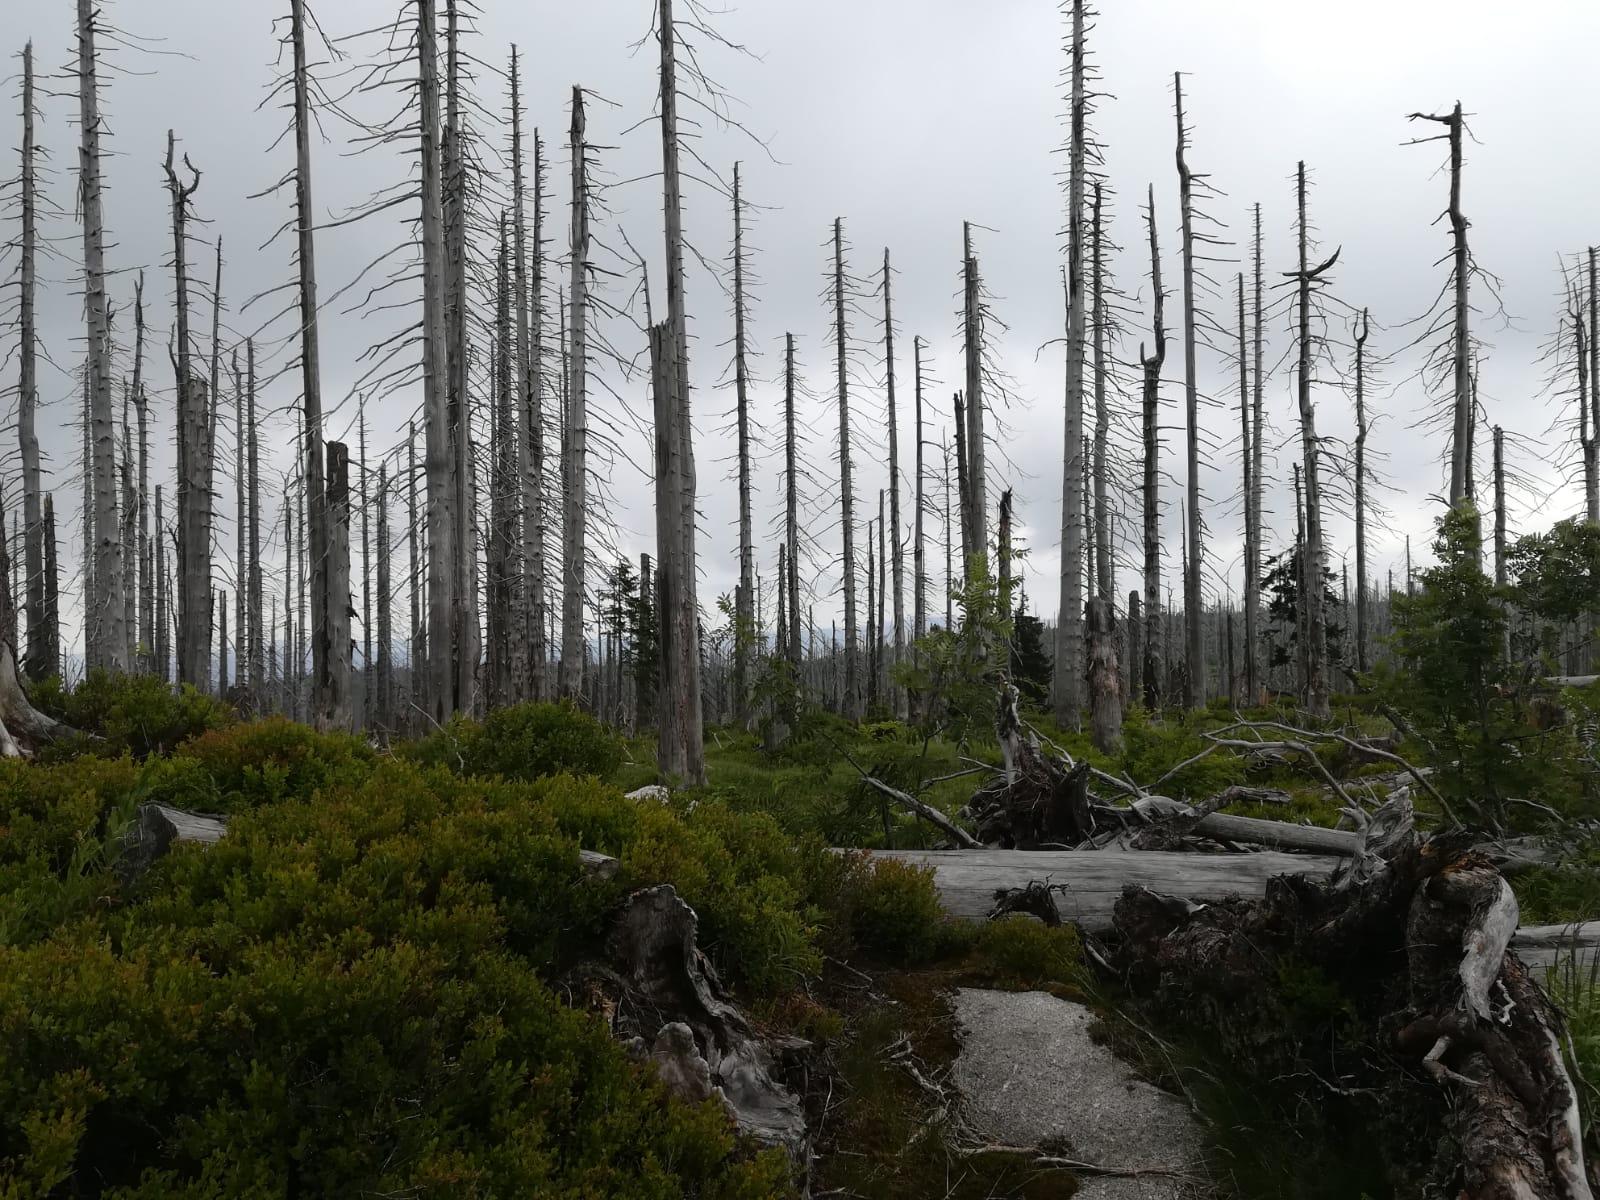 Wanderung – Tote Bäume